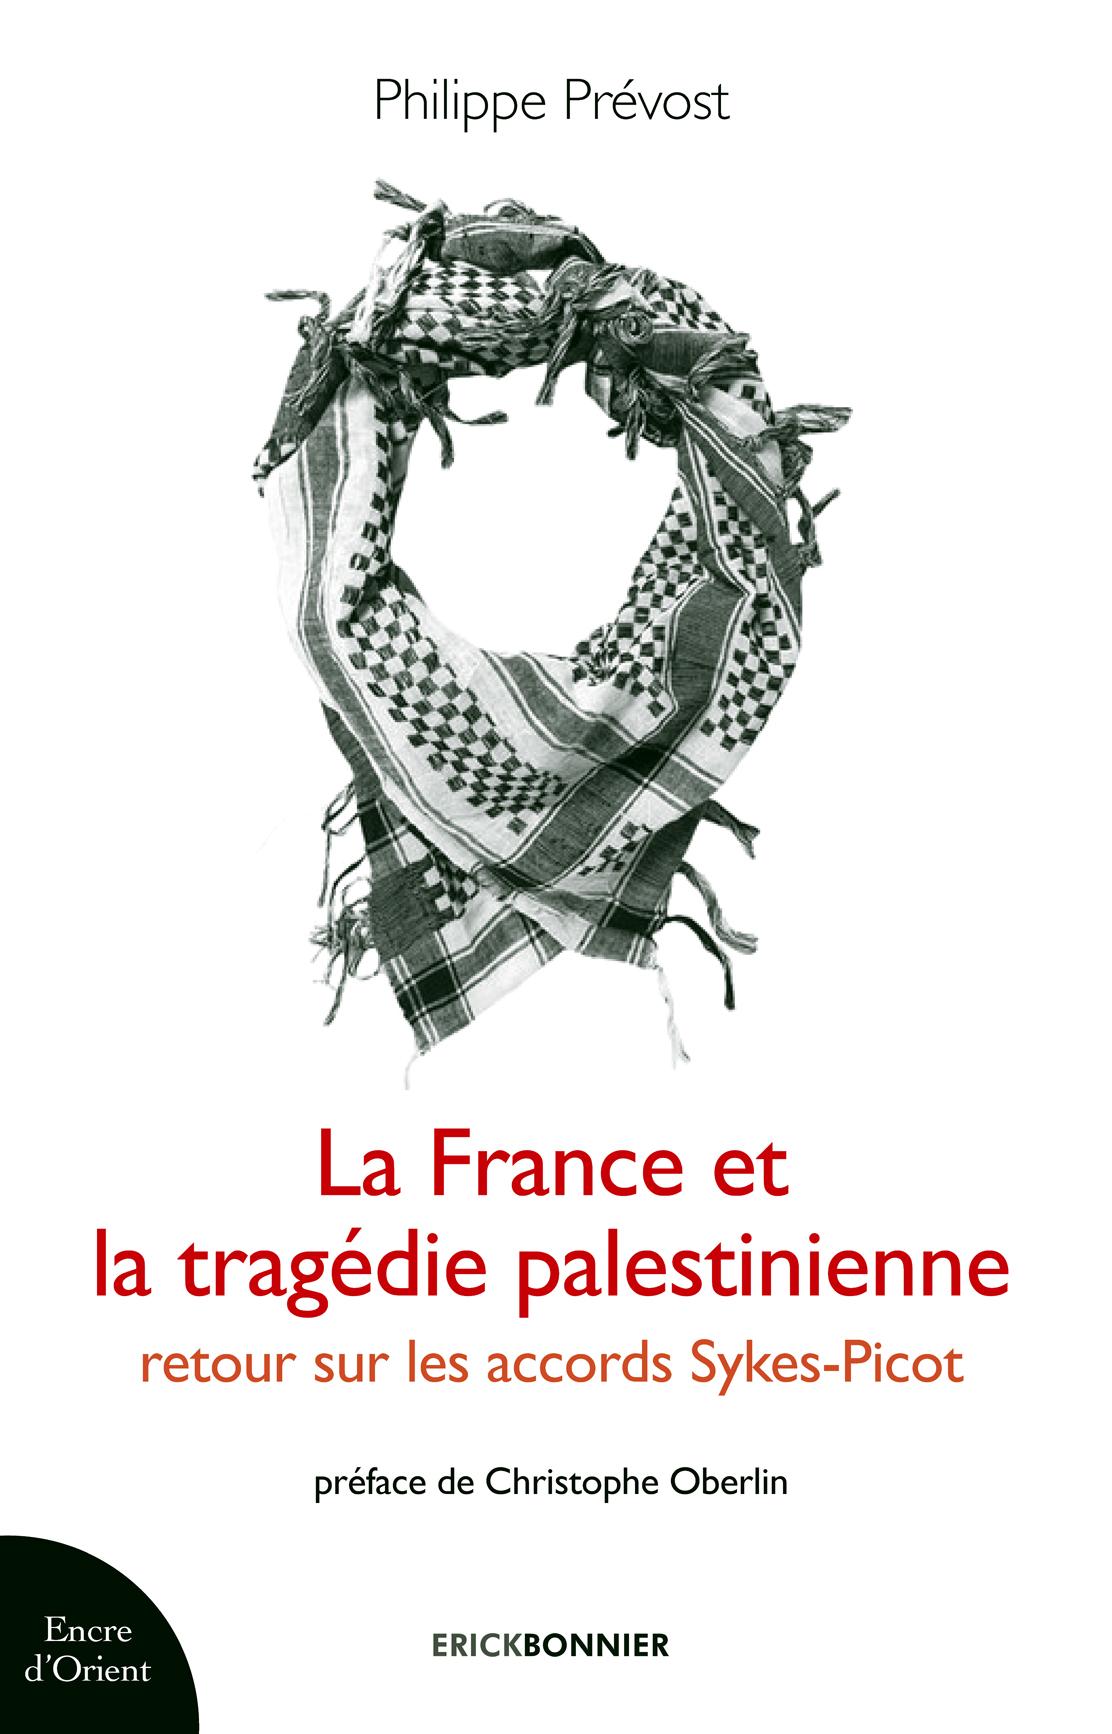 LA FRANCE ET LA TRAGEDIE PALESTINIENNE